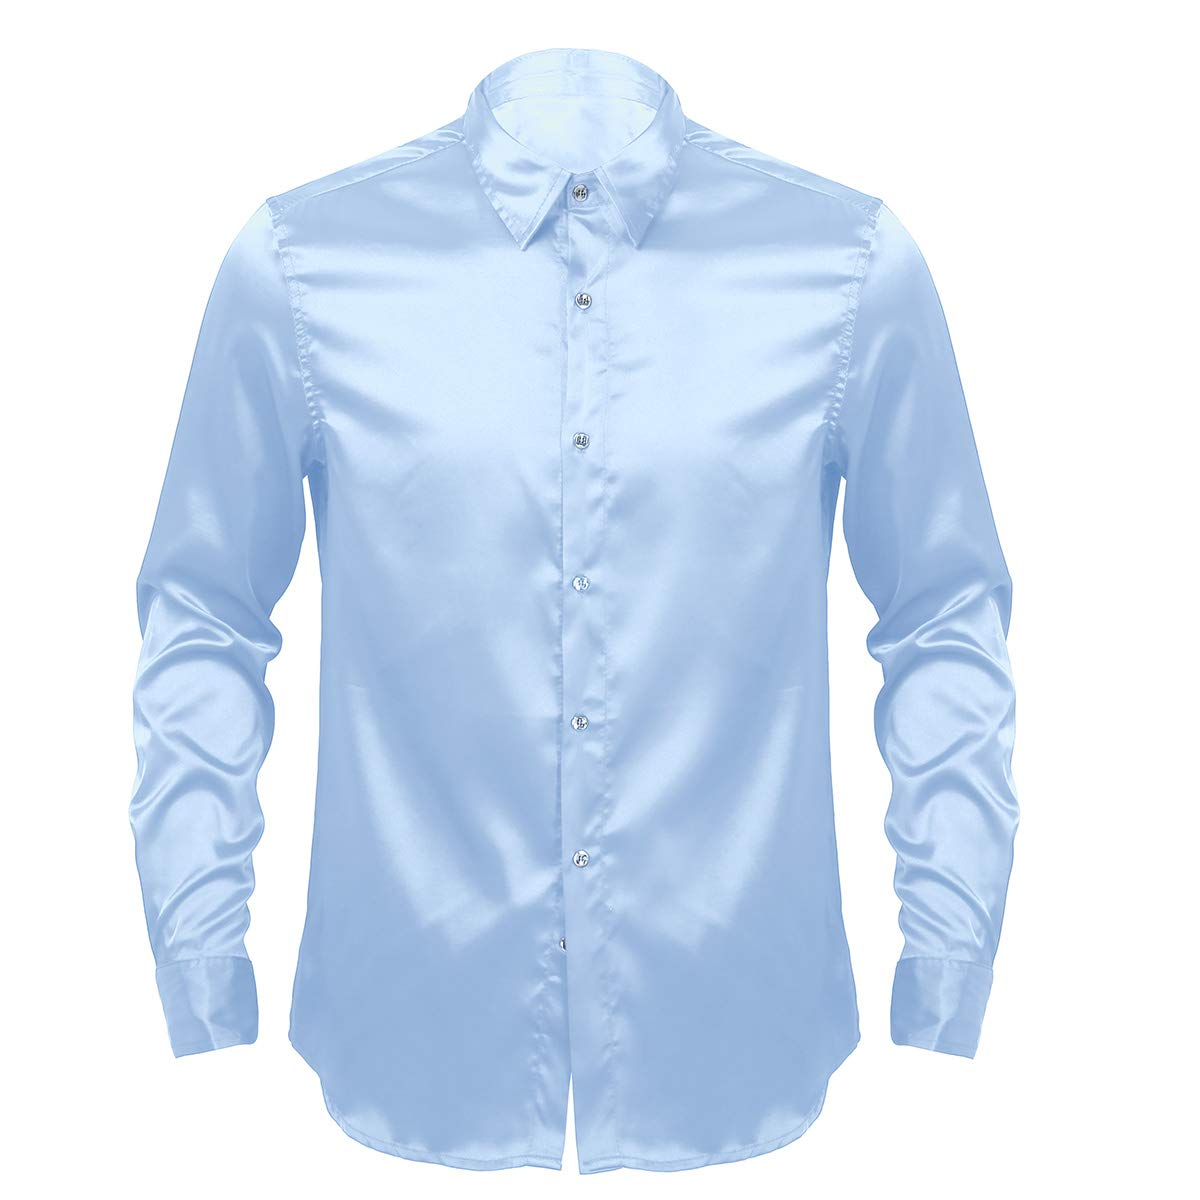 CHICTRY Mens Shiny Satin Silk Like Long Sleeve Dance Prom Button Down Dress Shirts